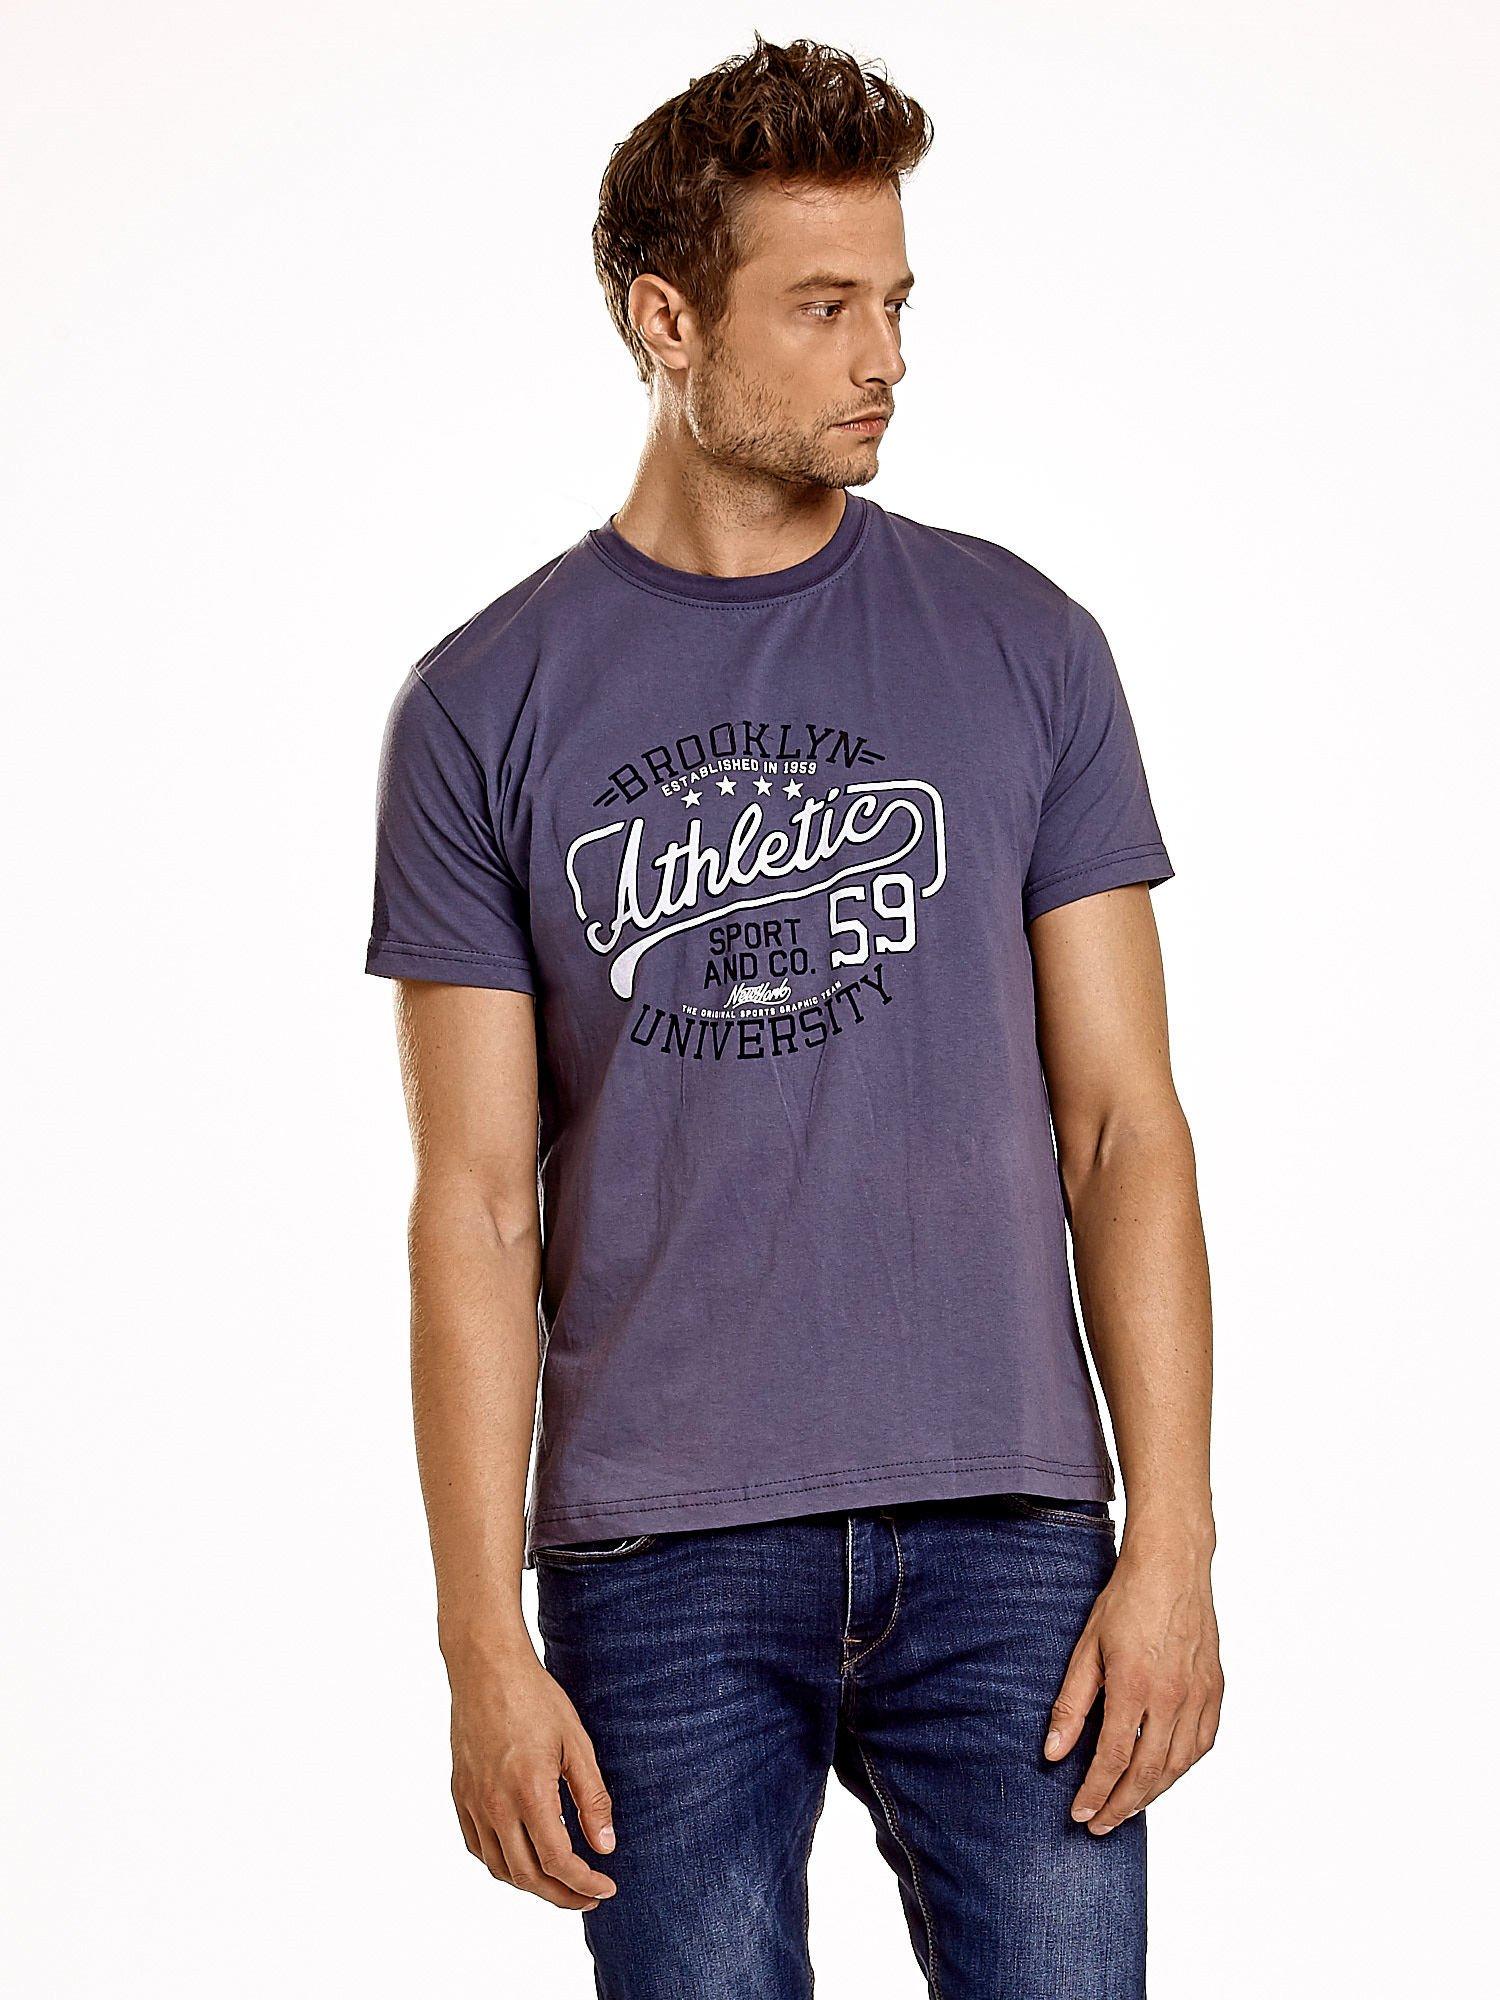 Ciemnoszary t-shirt męski z napisem BROOKLYN ATHLETIC UNIVERSITY                                  zdj.                                  2